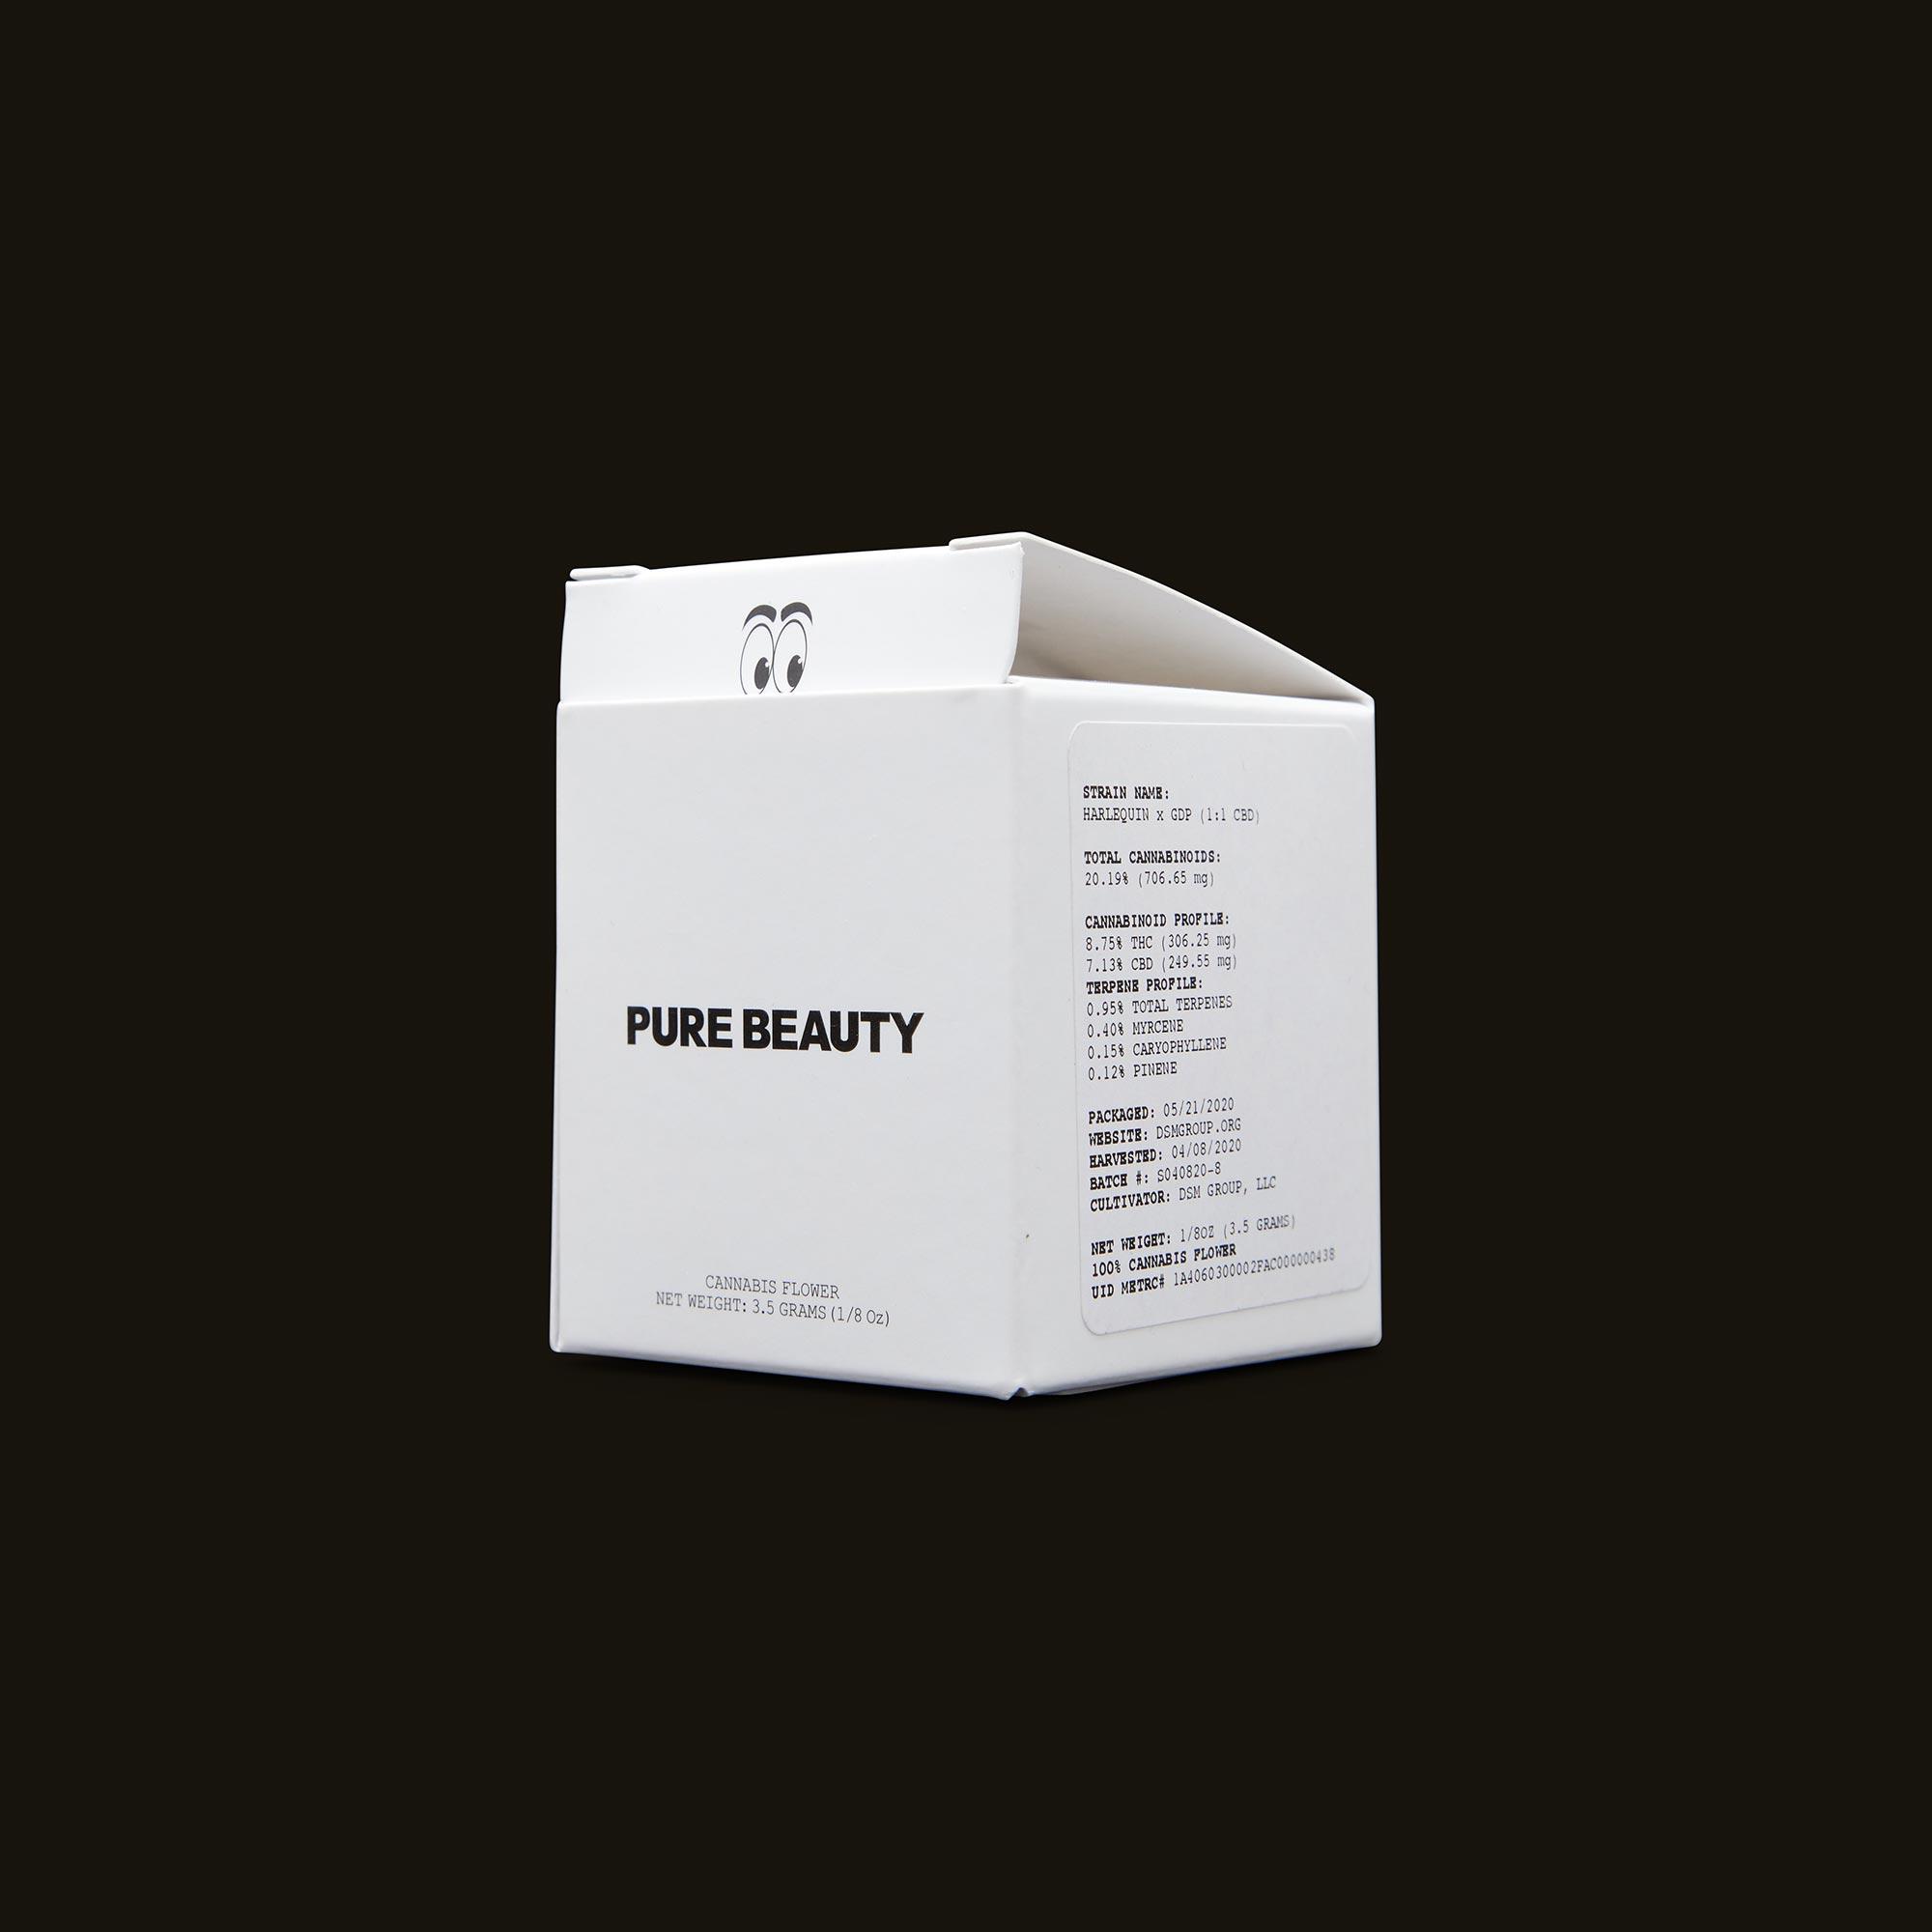 Pure Beauty Harlequin x GDP Side Box